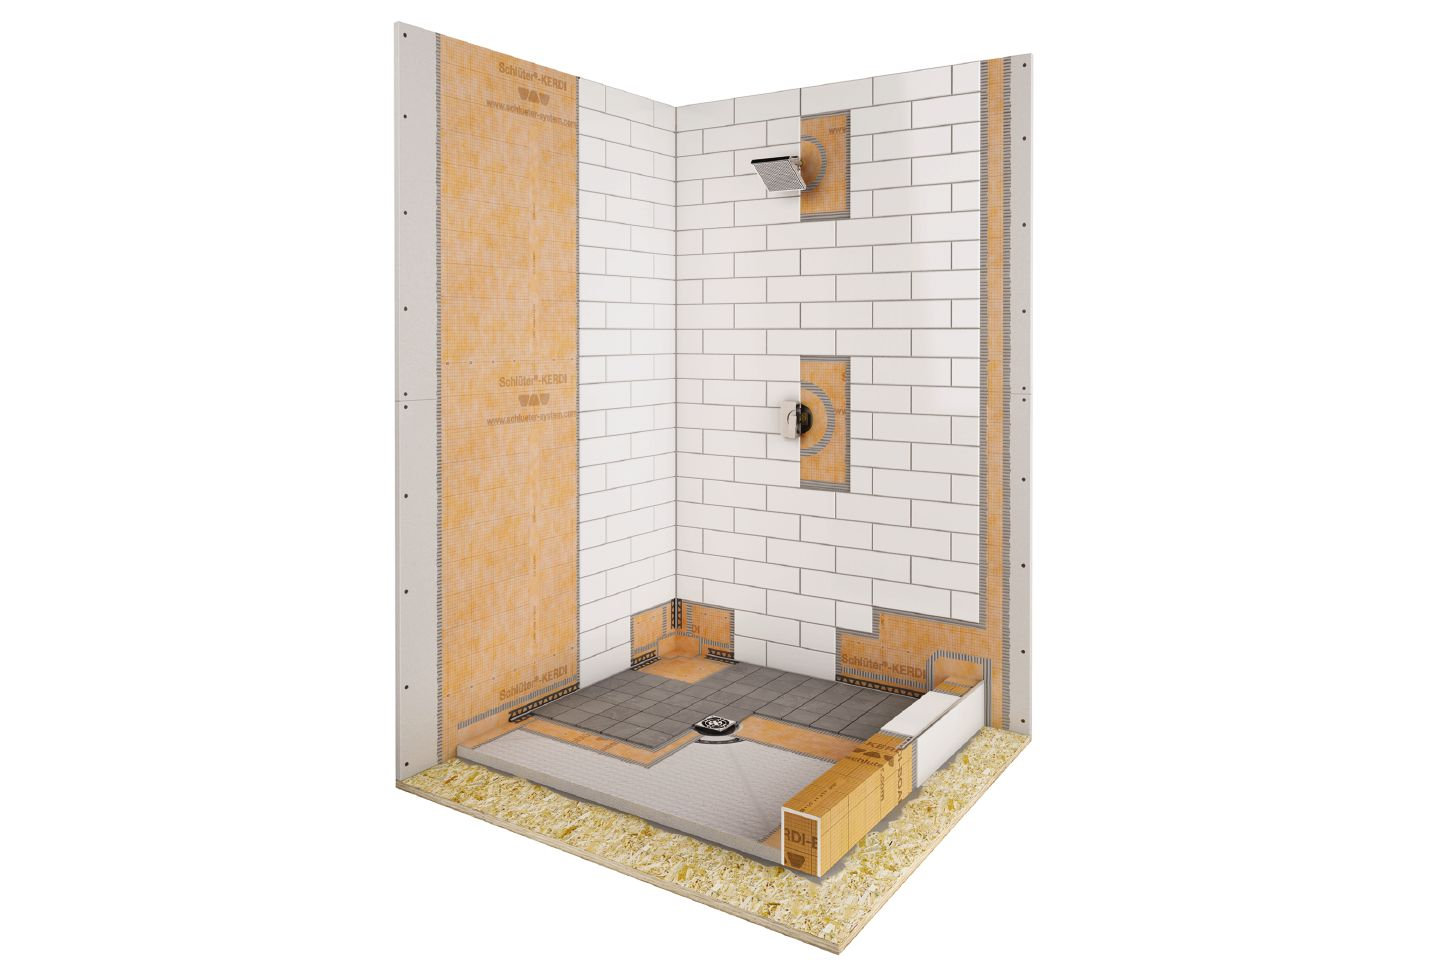 Shower with point drain | schluter.com